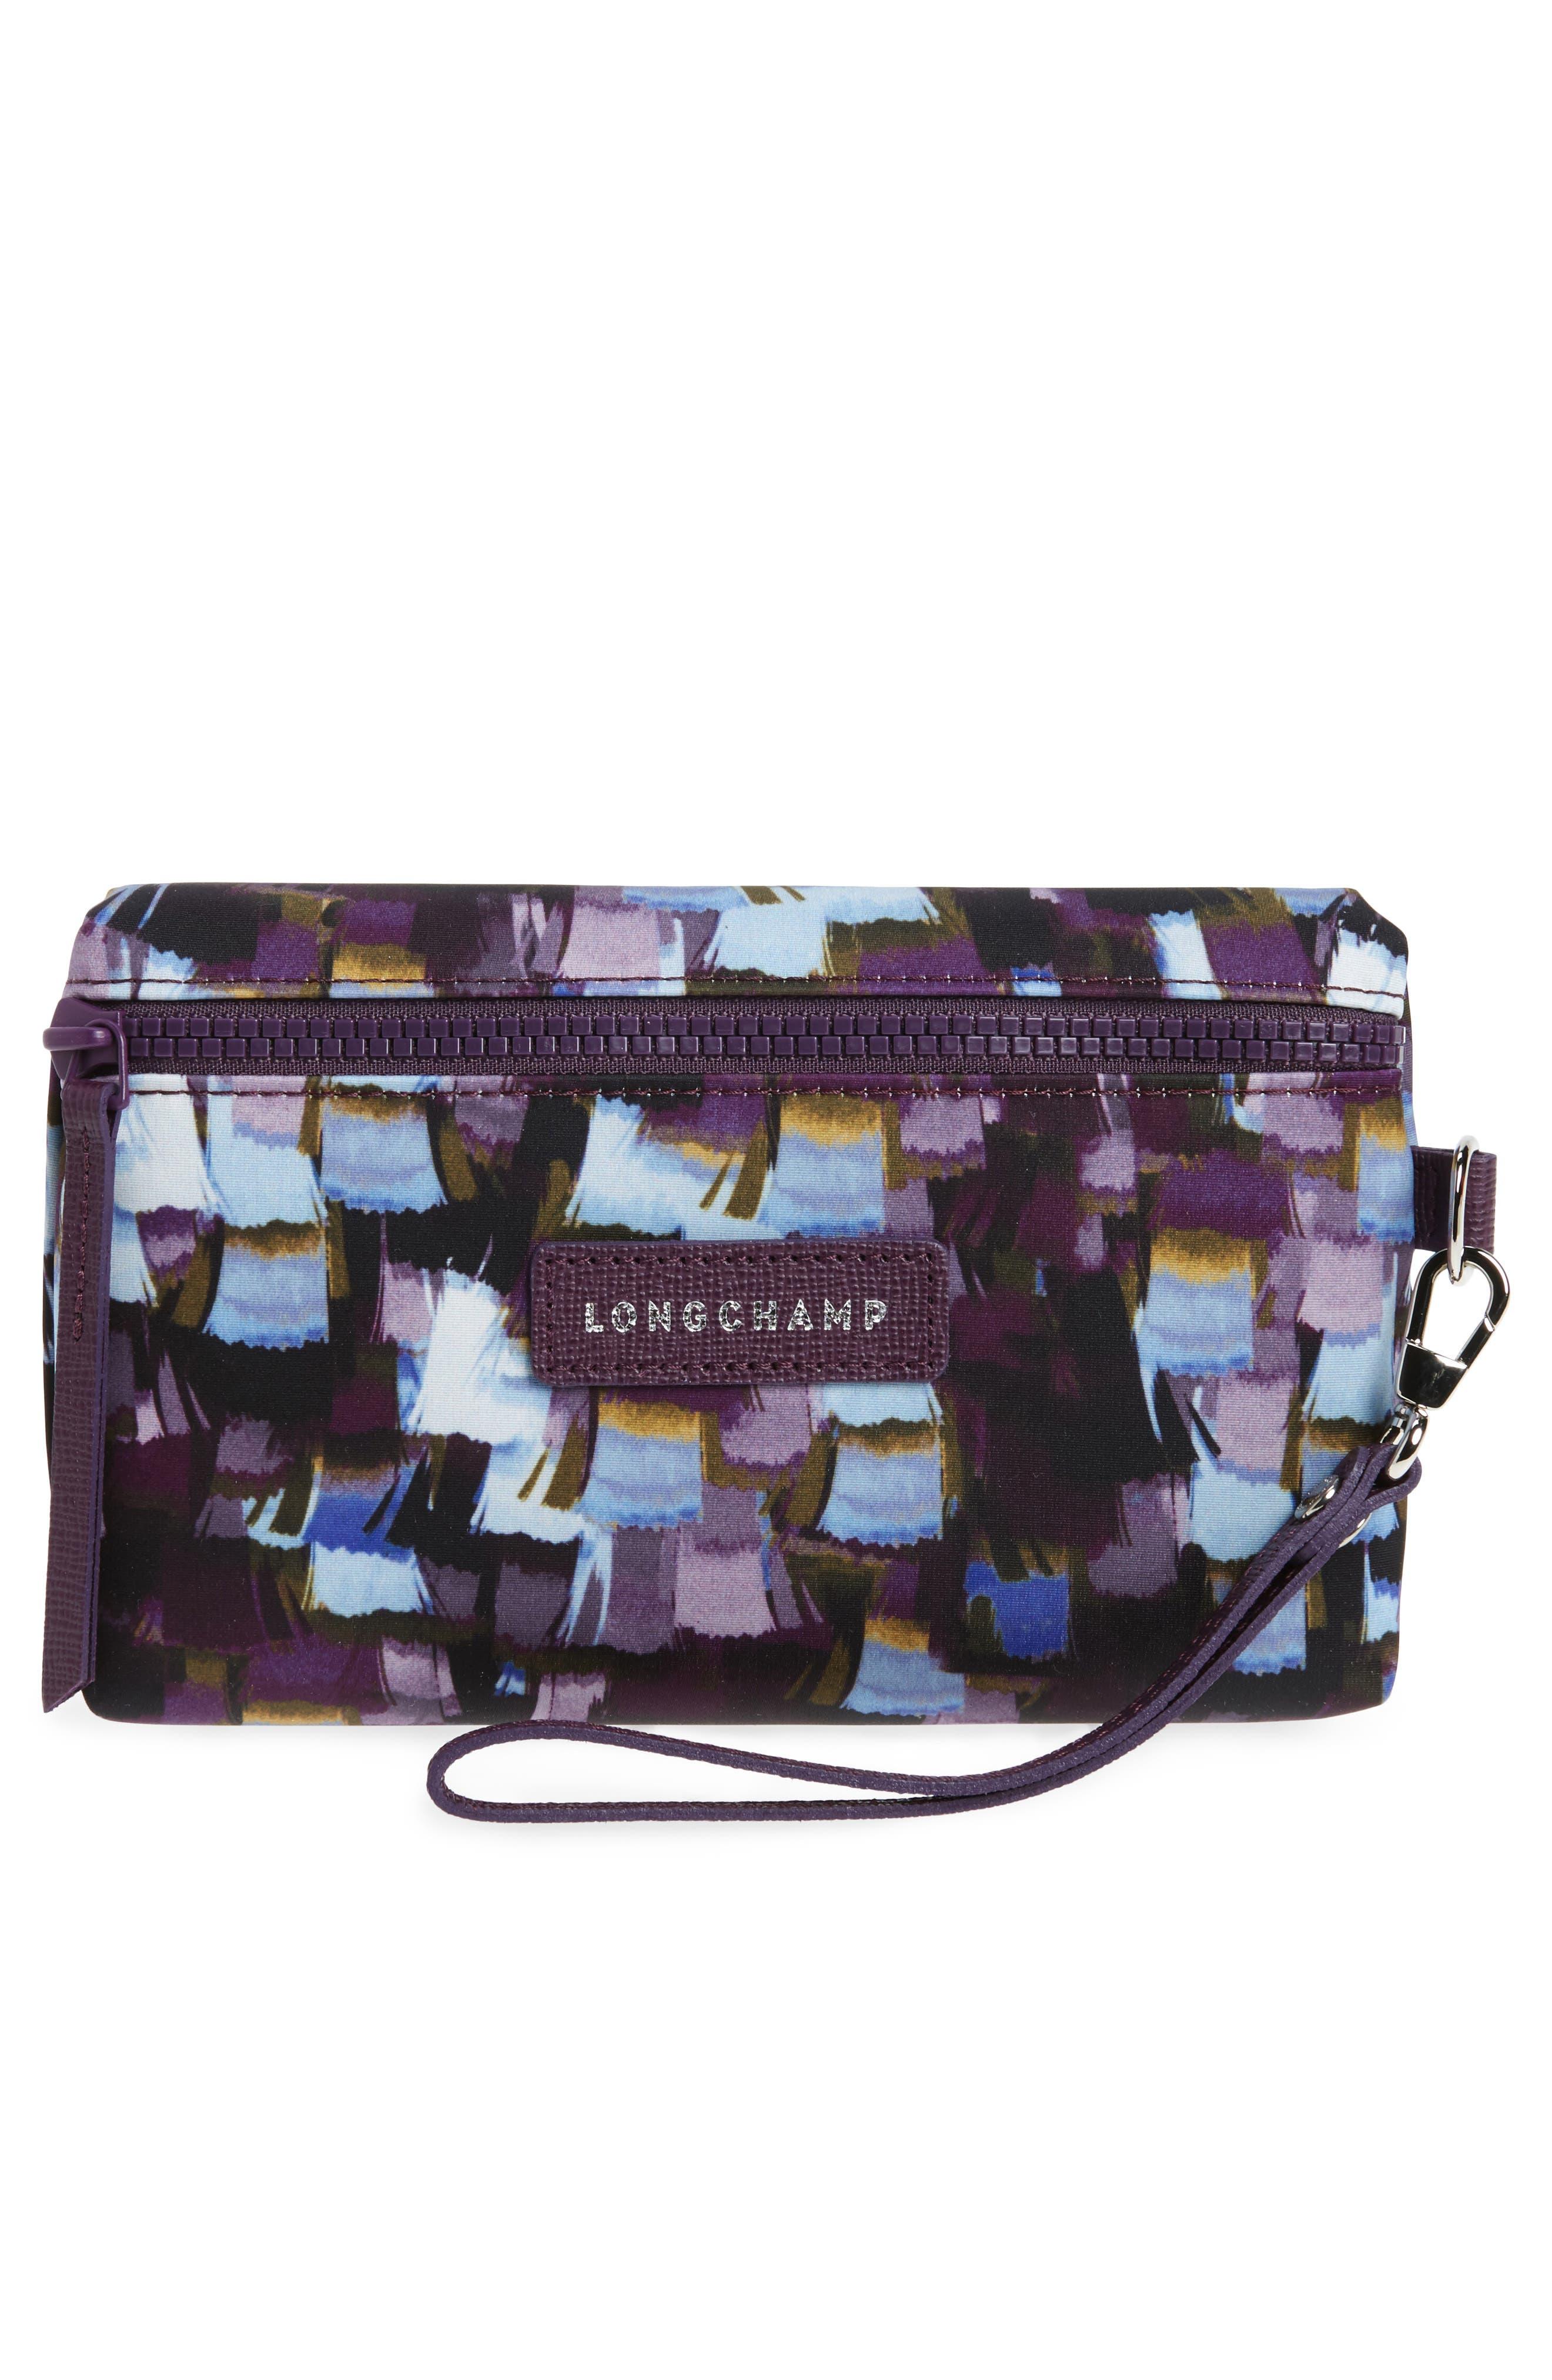 Alternate Image 1 Selected - Longchamp Le Pliage Neo - Vibrations Nylon Cosmetics Case